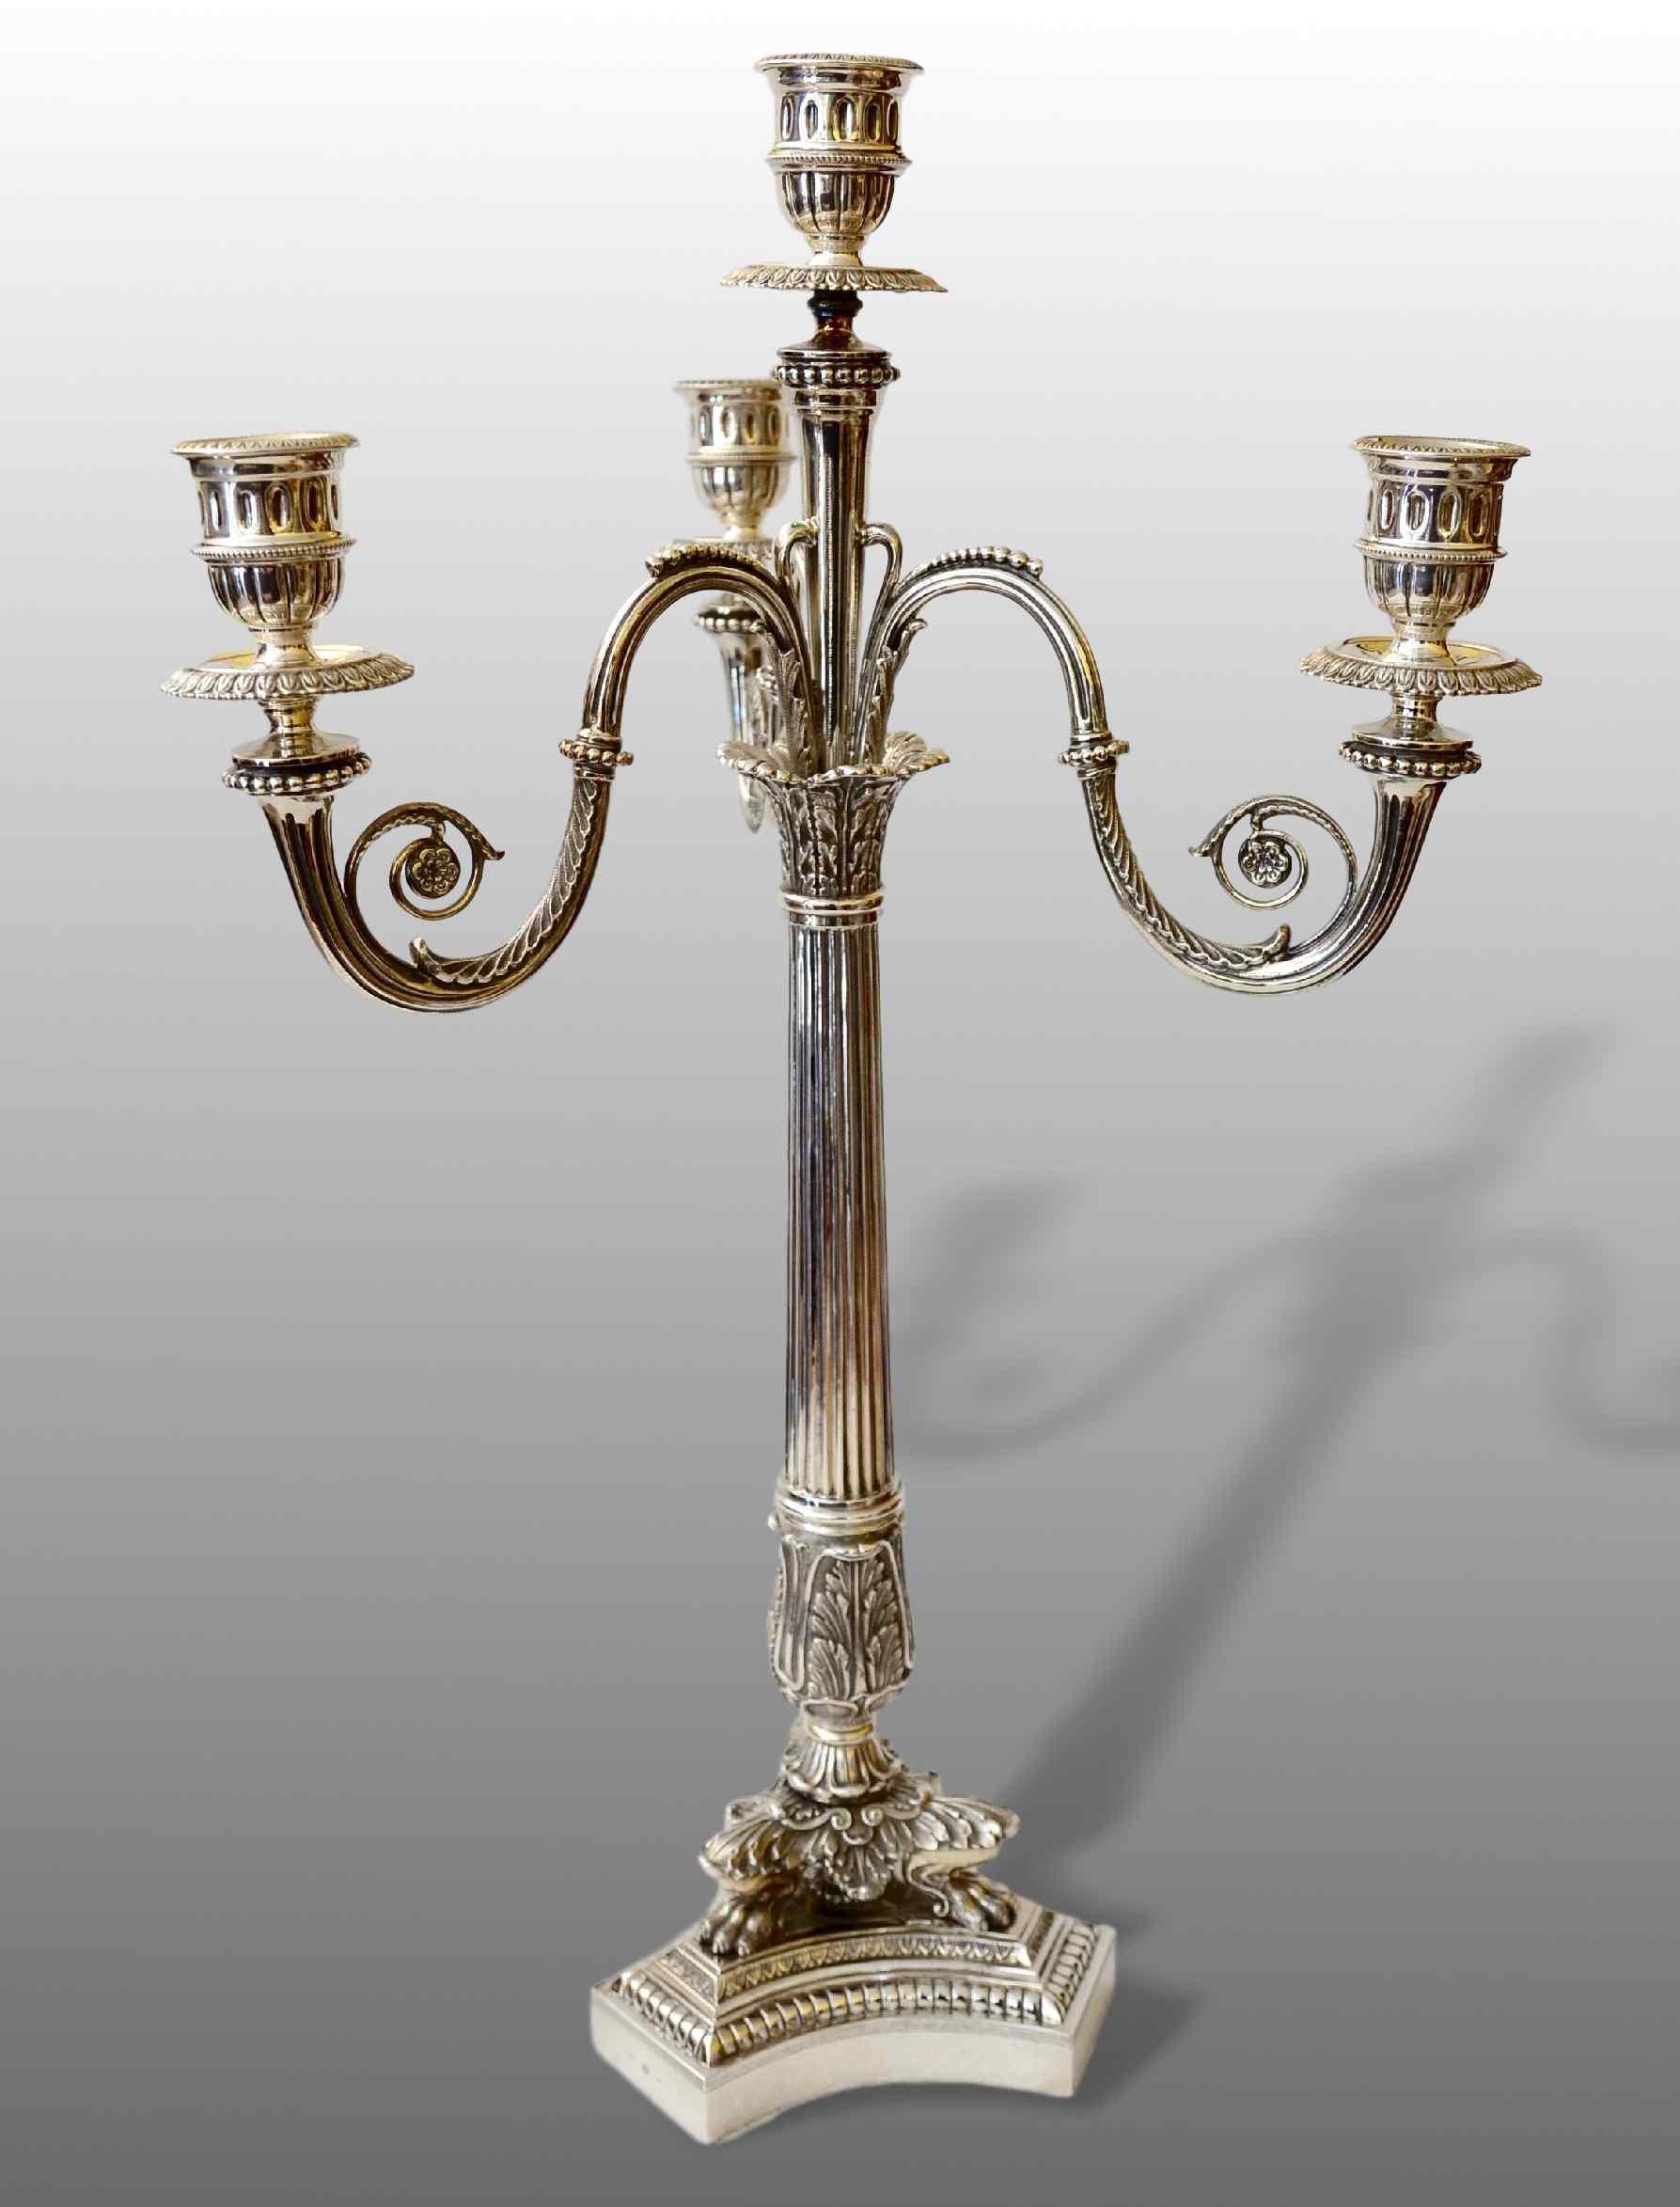 Candelabro in stile impero argento 925 milano for Design in stile romano